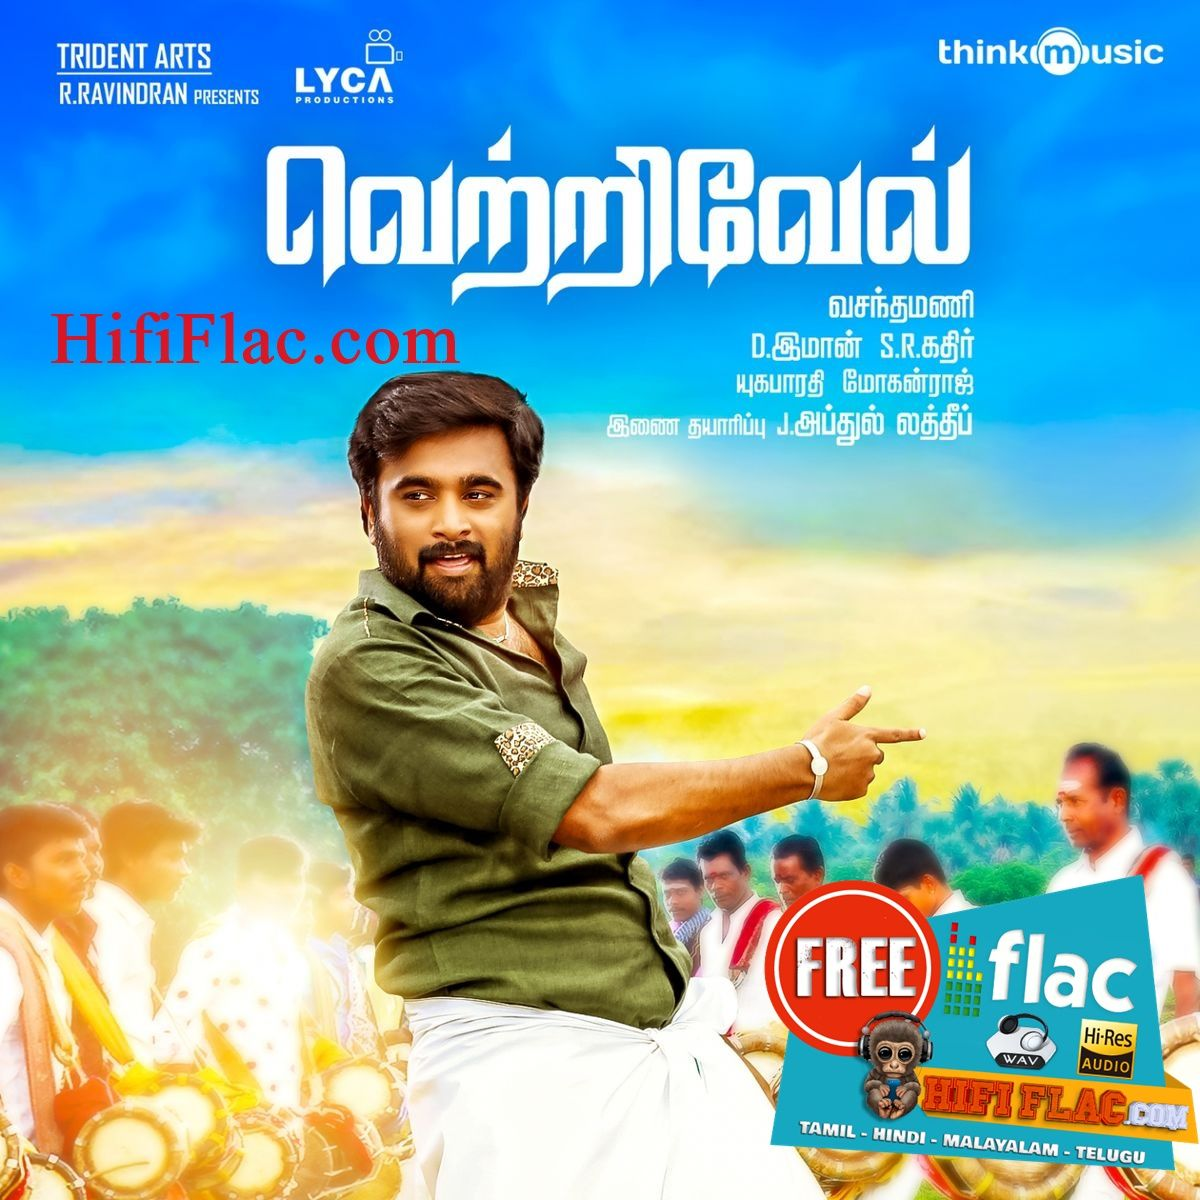 vetrivel movie download hd 1080p free download